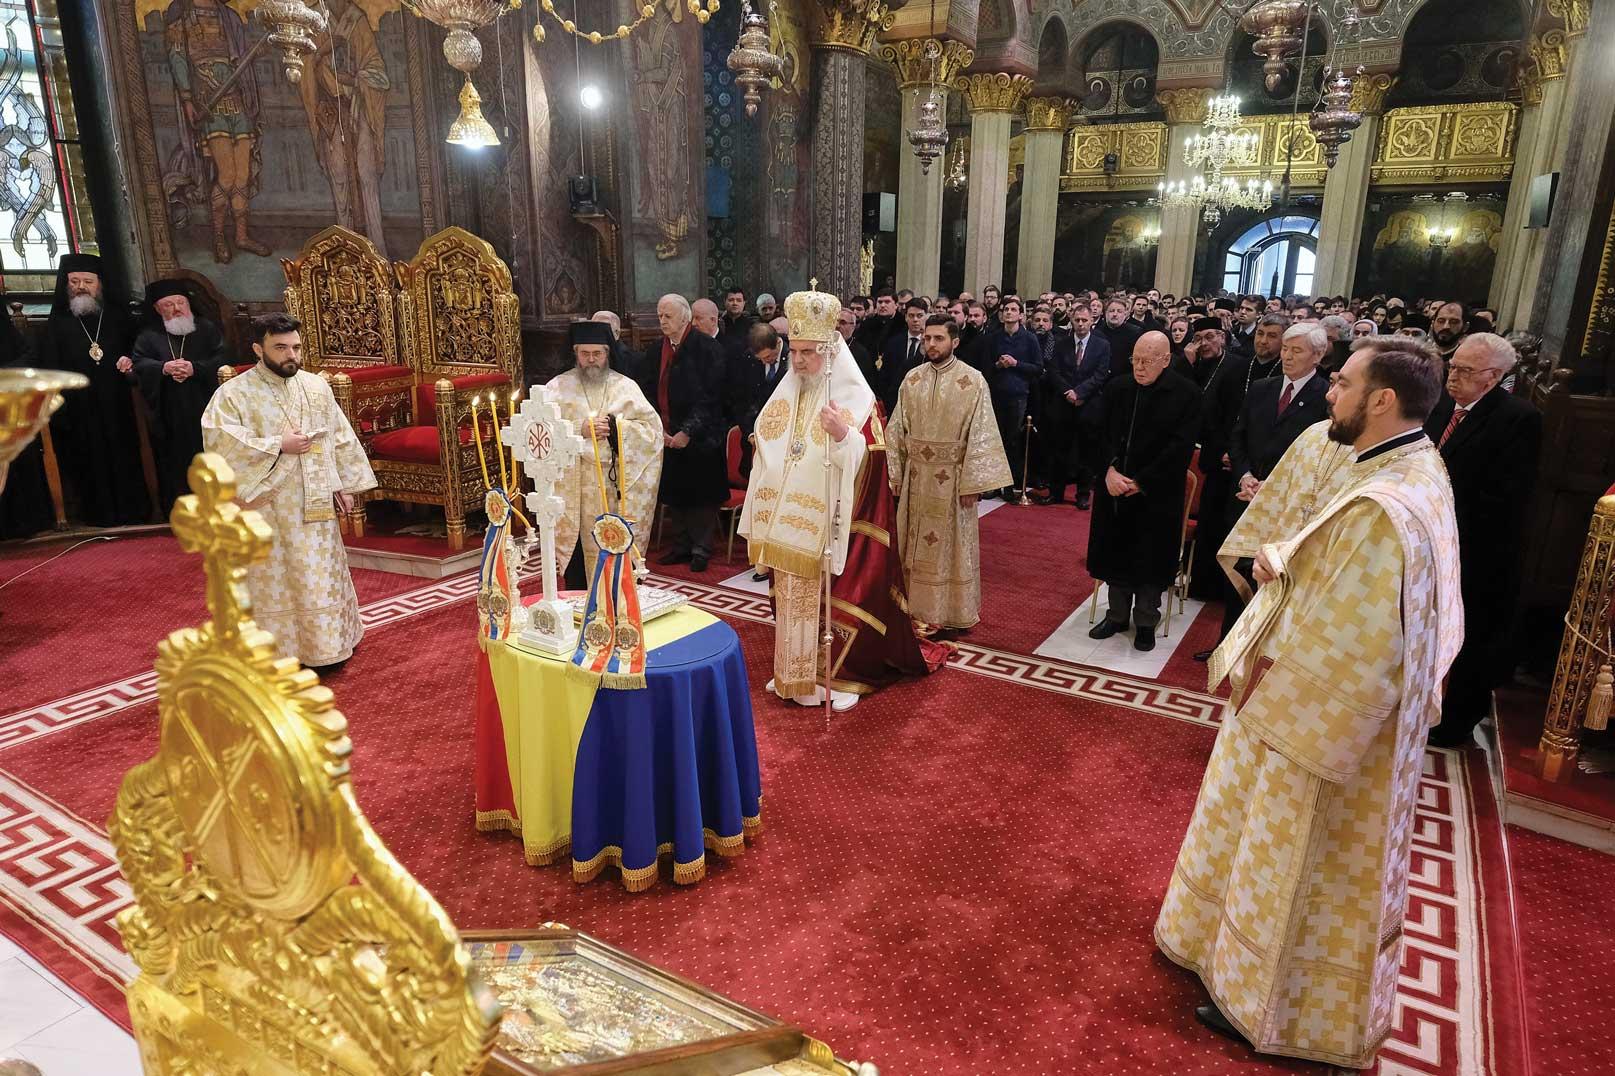 Aniversarea Unirii Principatelor Române la Patriarhie